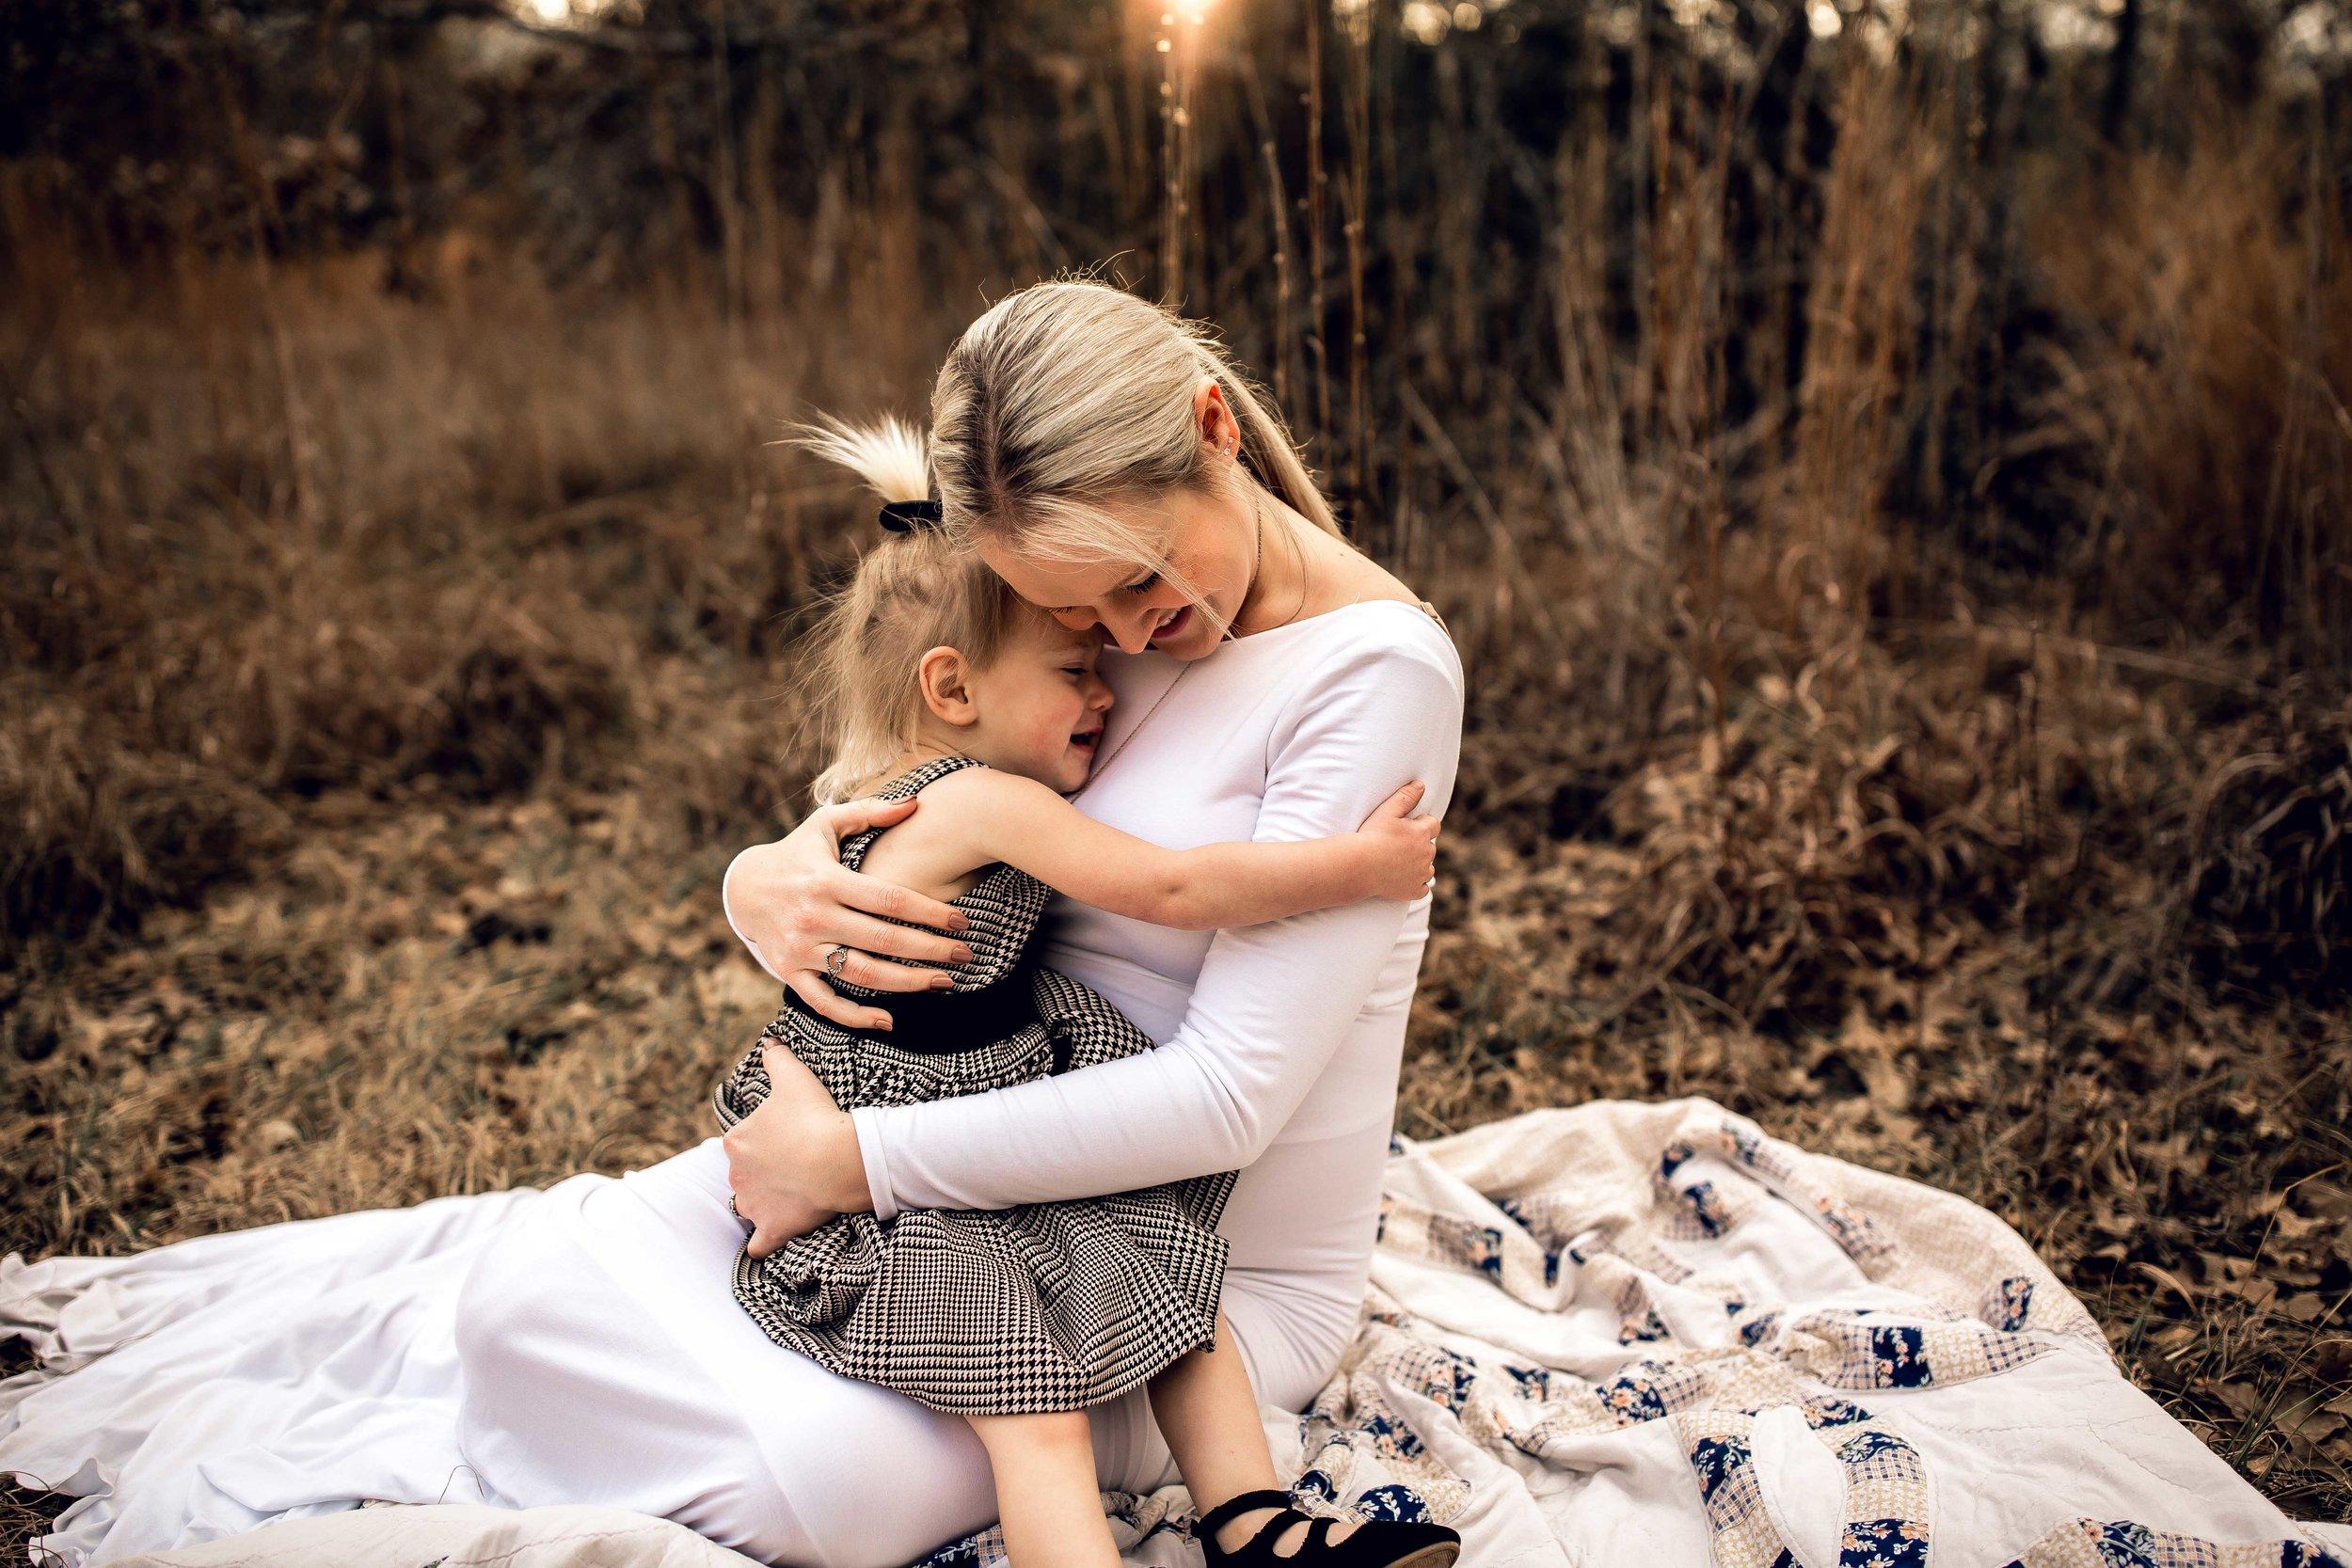 shelby-schiller-photography-maternity-daughter-hugging-mom.jpg